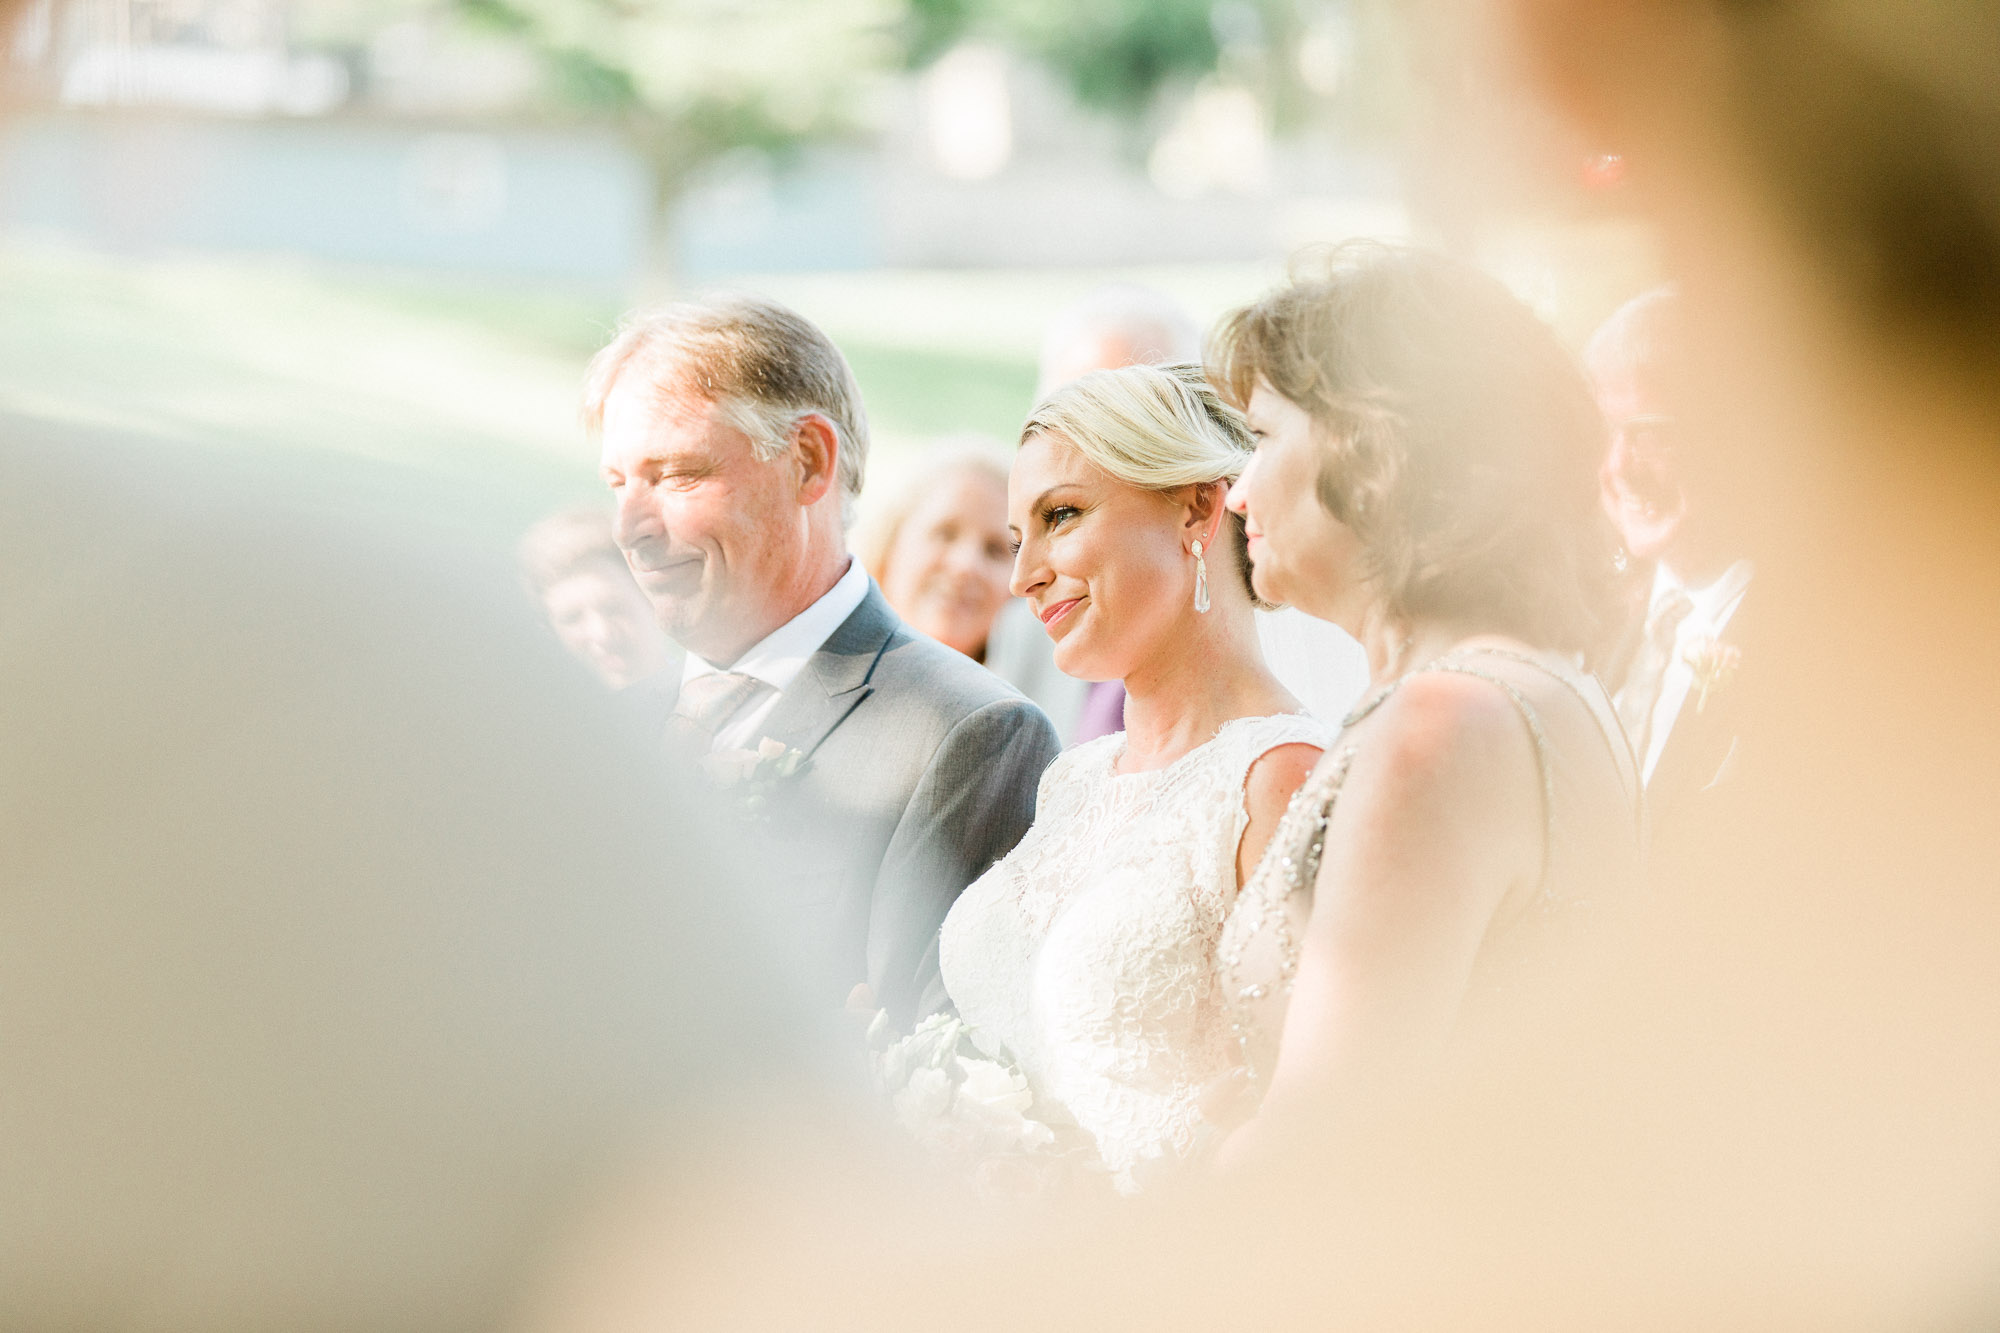 Allenberry-resort-historic-pennsylvania-wedding-21899.jpg